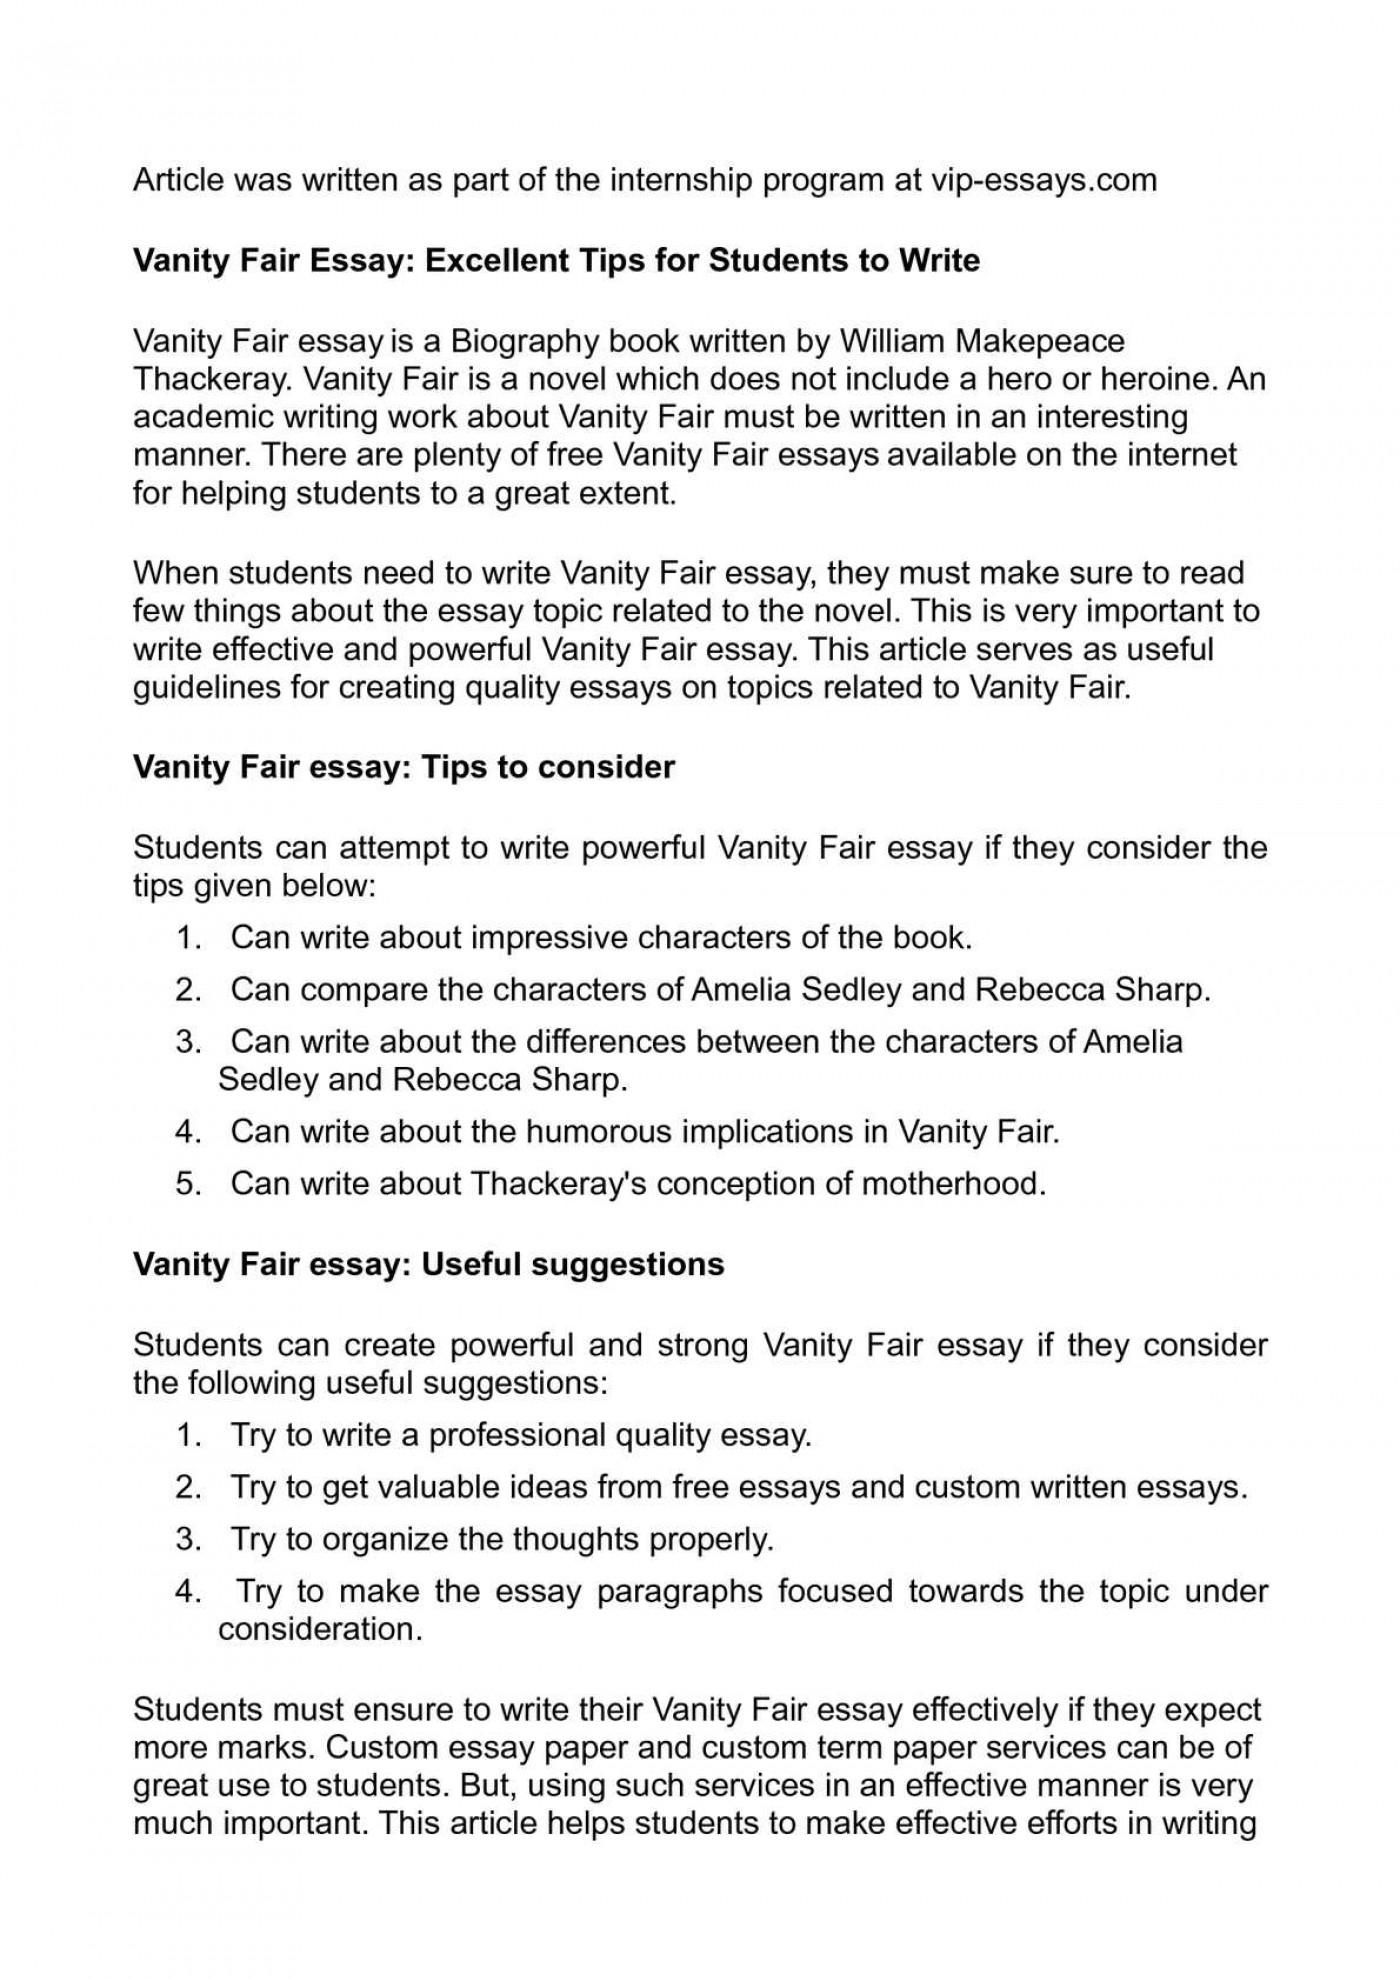 001 P1 Essay Example On Stupendous Vanity Definition Fair Montaigne's 1400